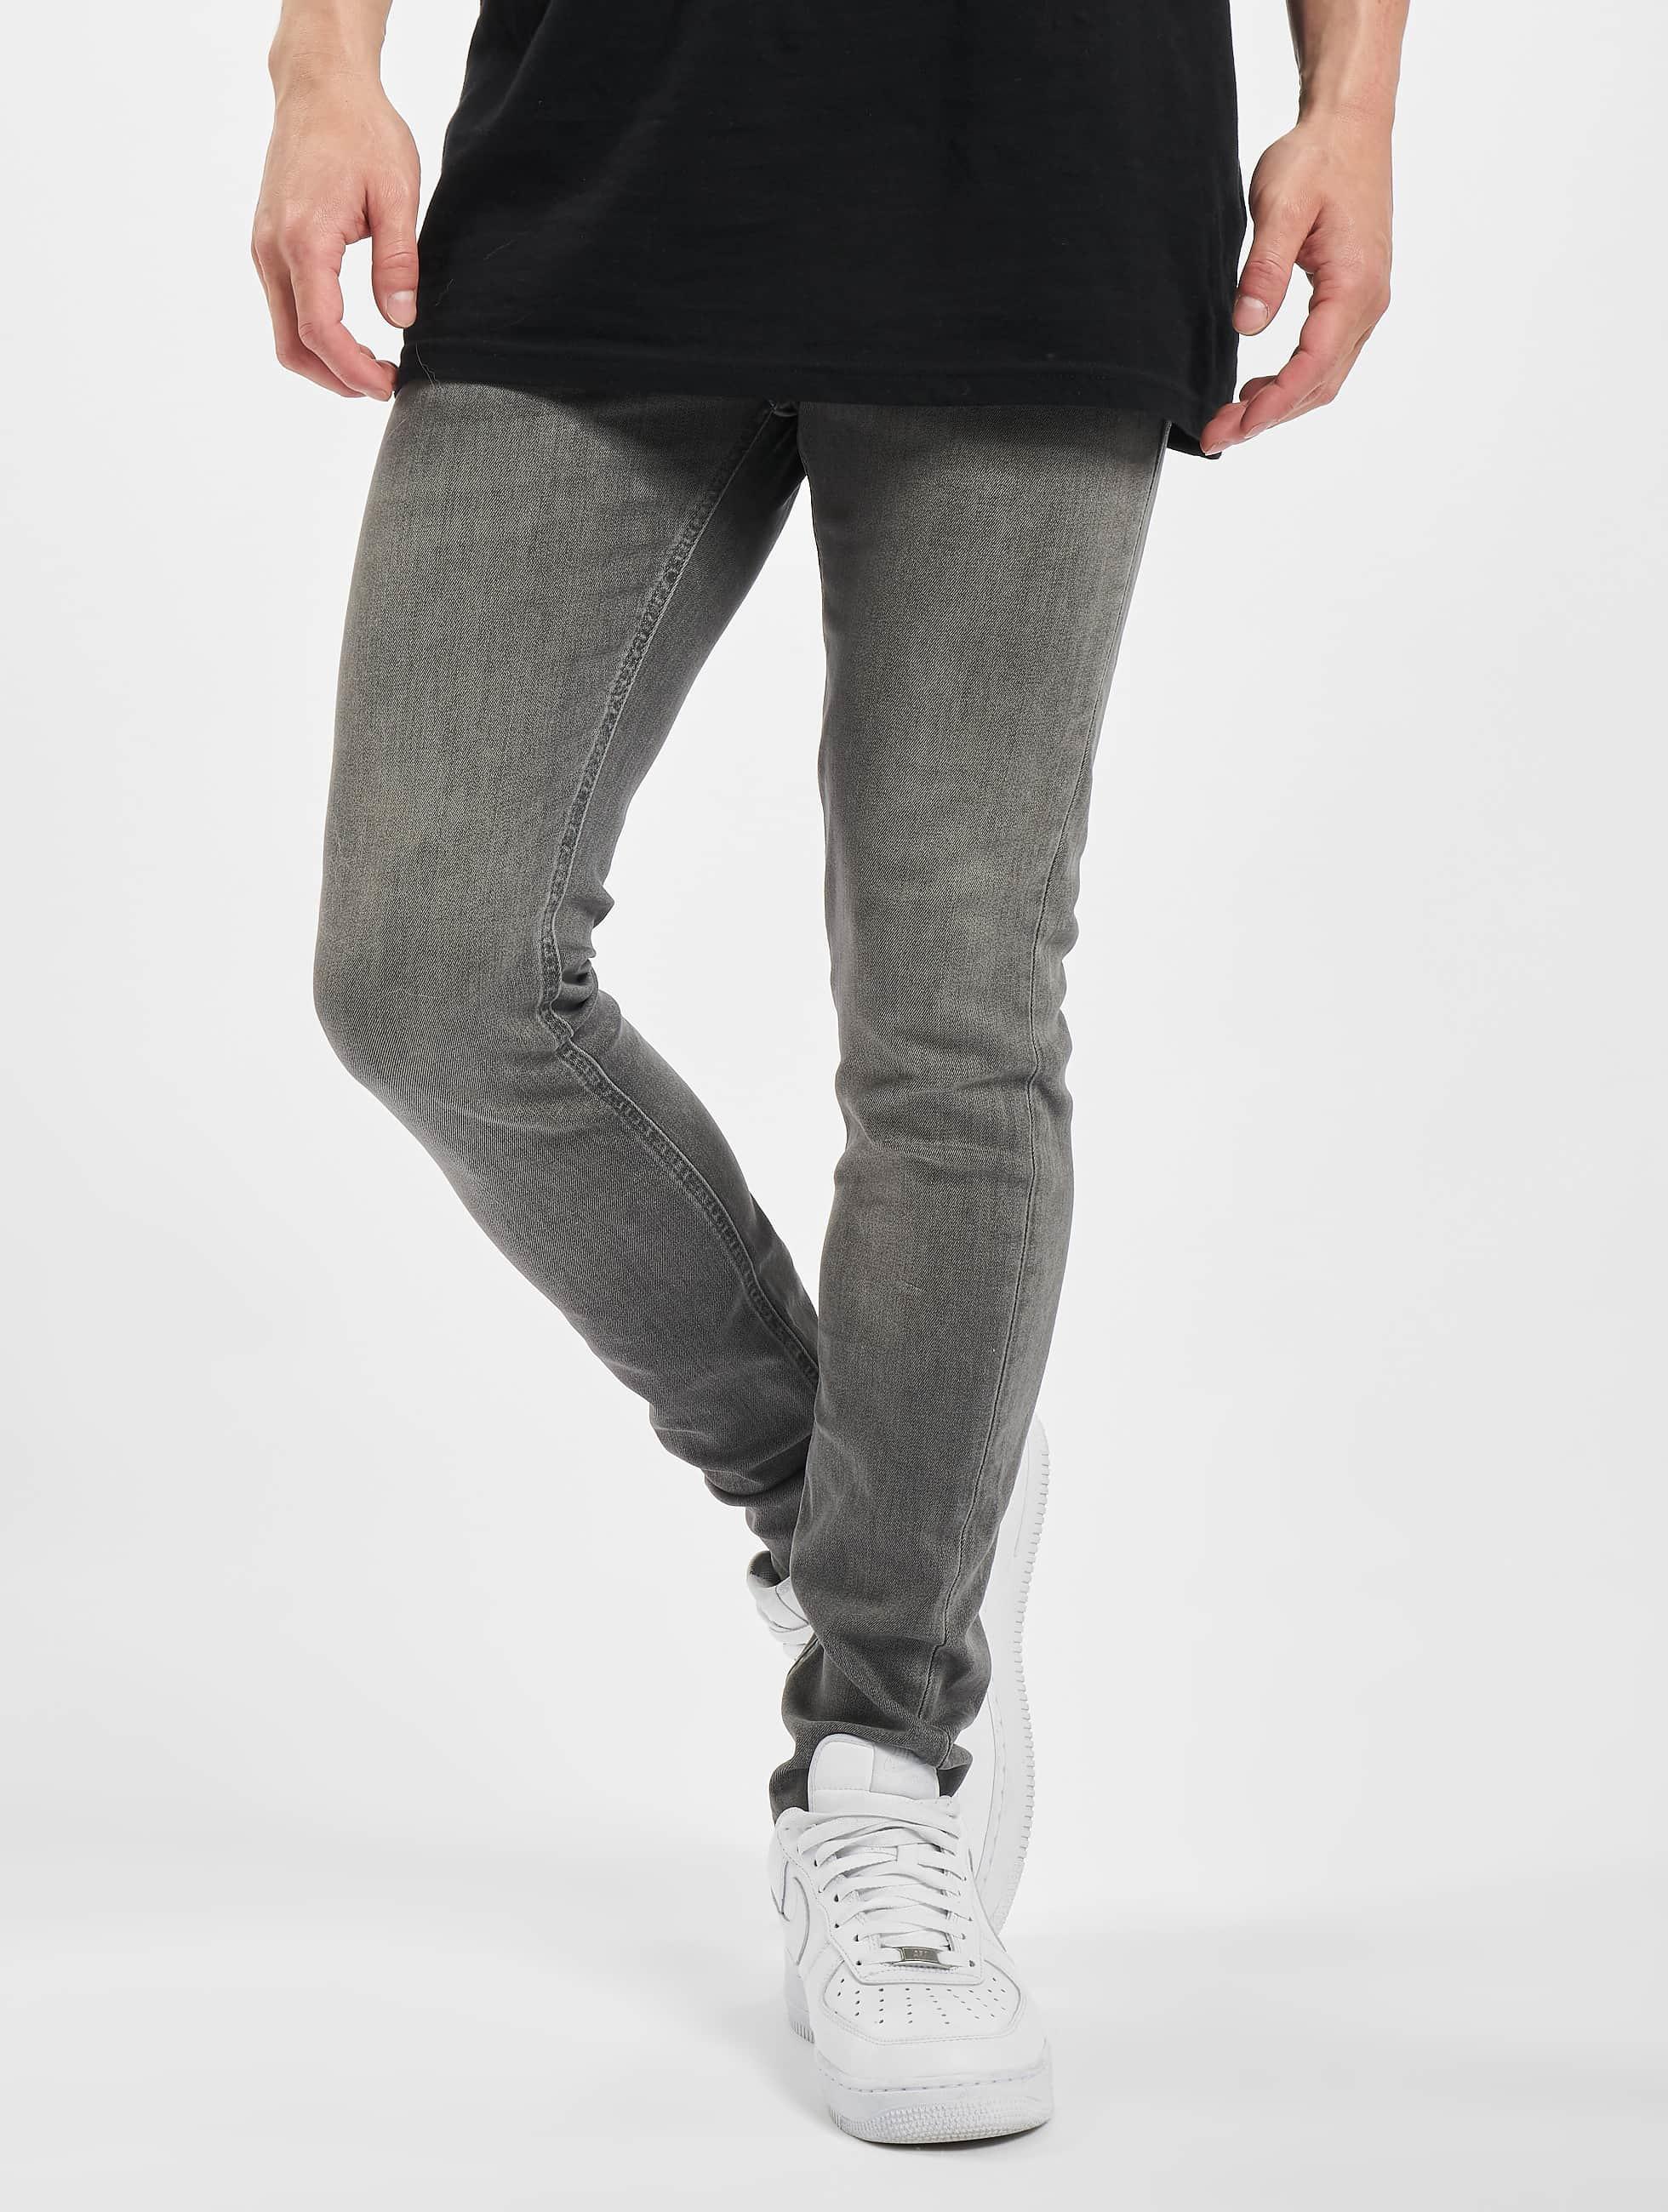 ripped jeans herren grau super jeans in dieser saison. Black Bedroom Furniture Sets. Home Design Ideas